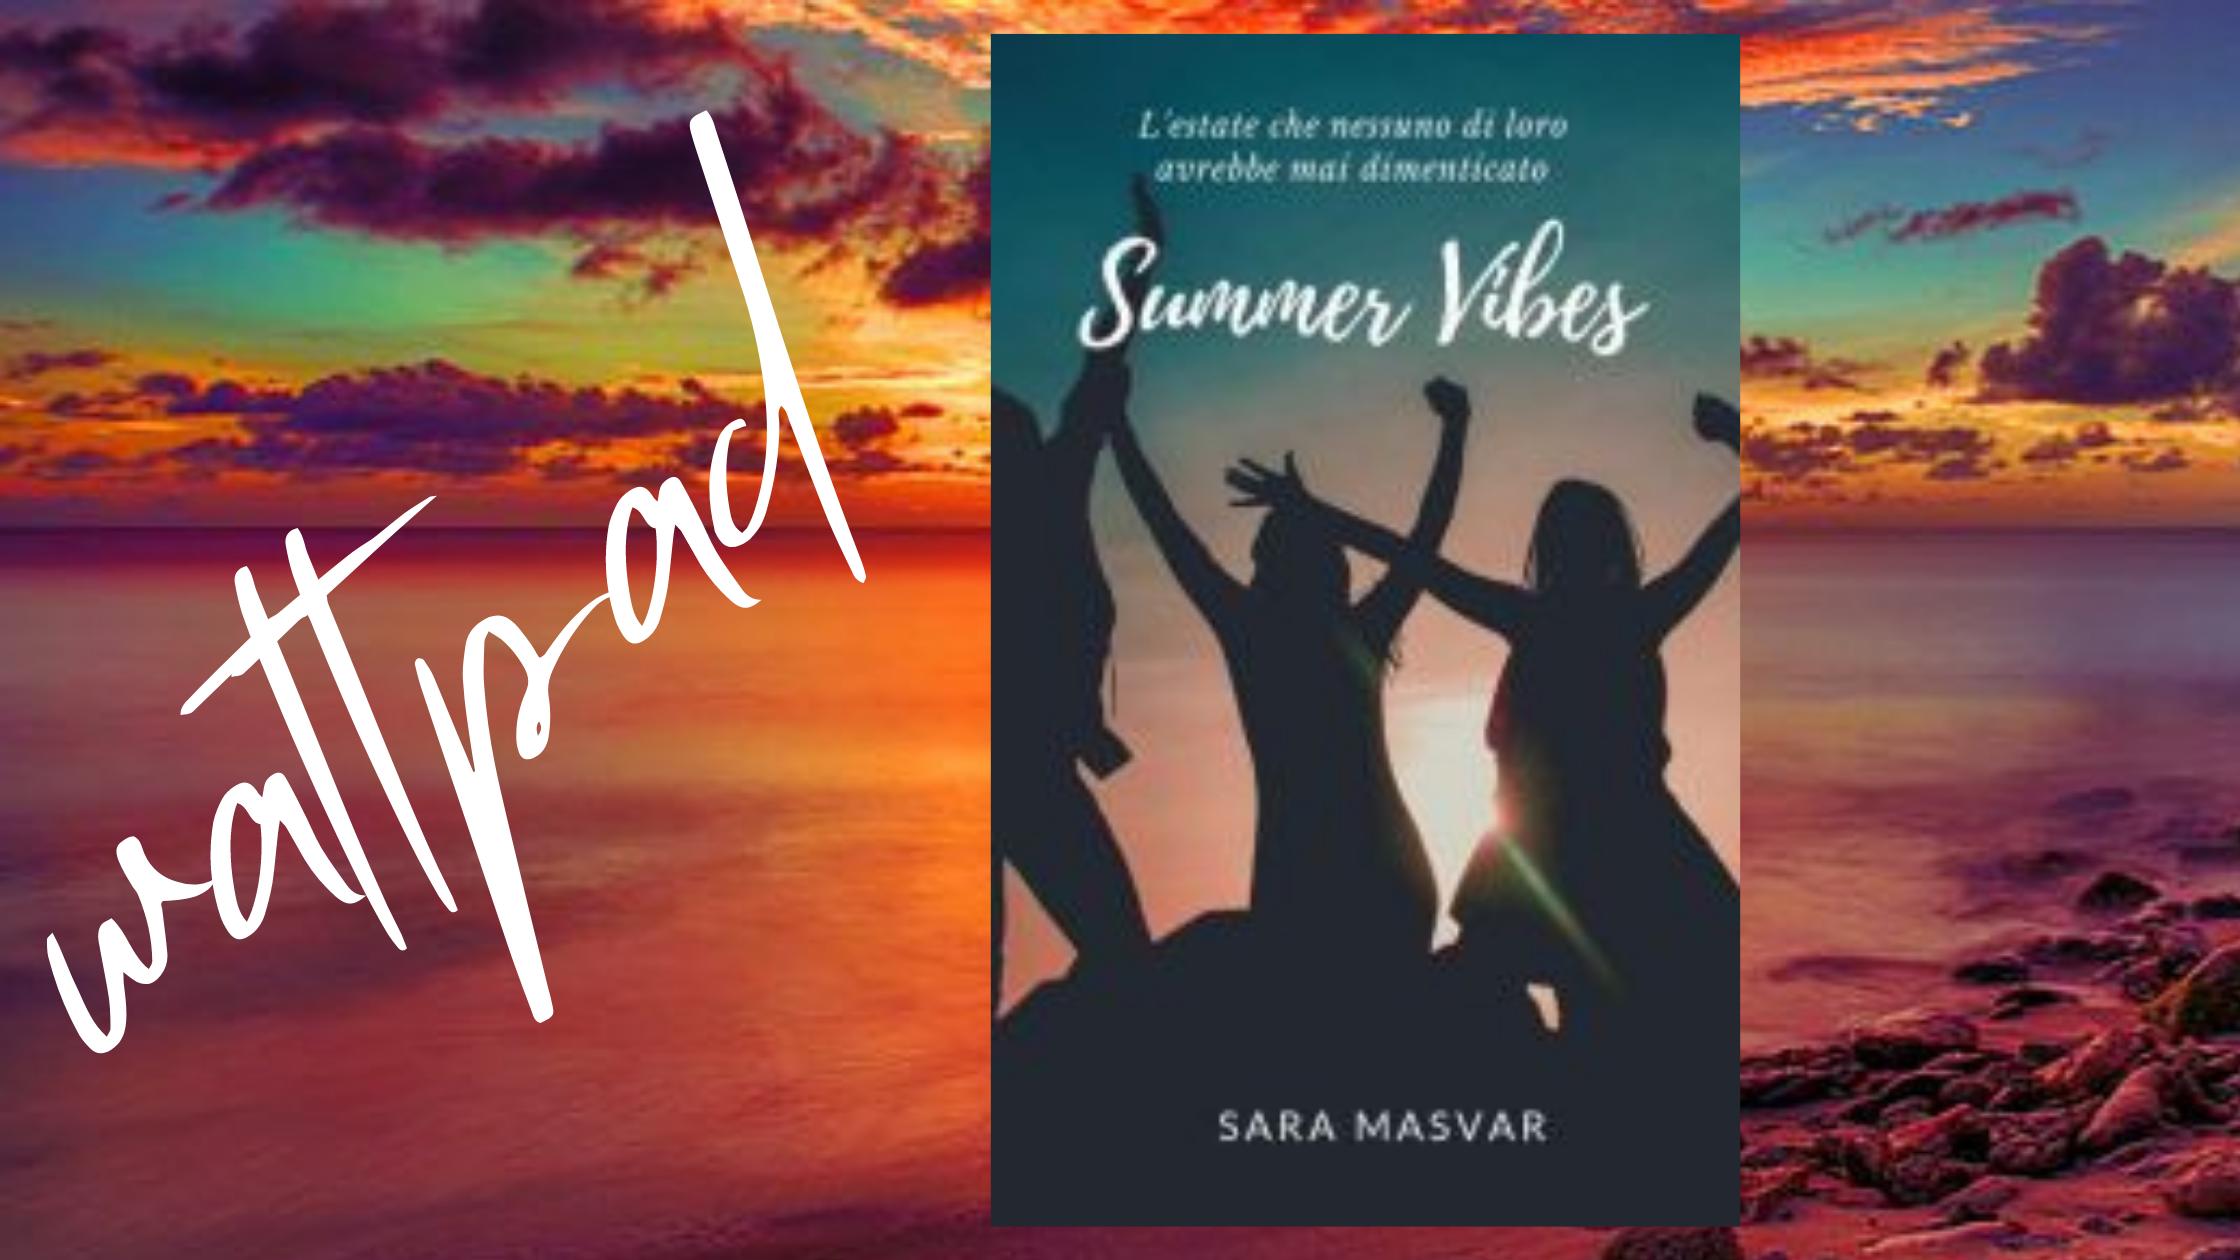 summer vibes wattpad sara masvar leggi gratis teen drama racconto estate malta 2019 casualità incontri amici